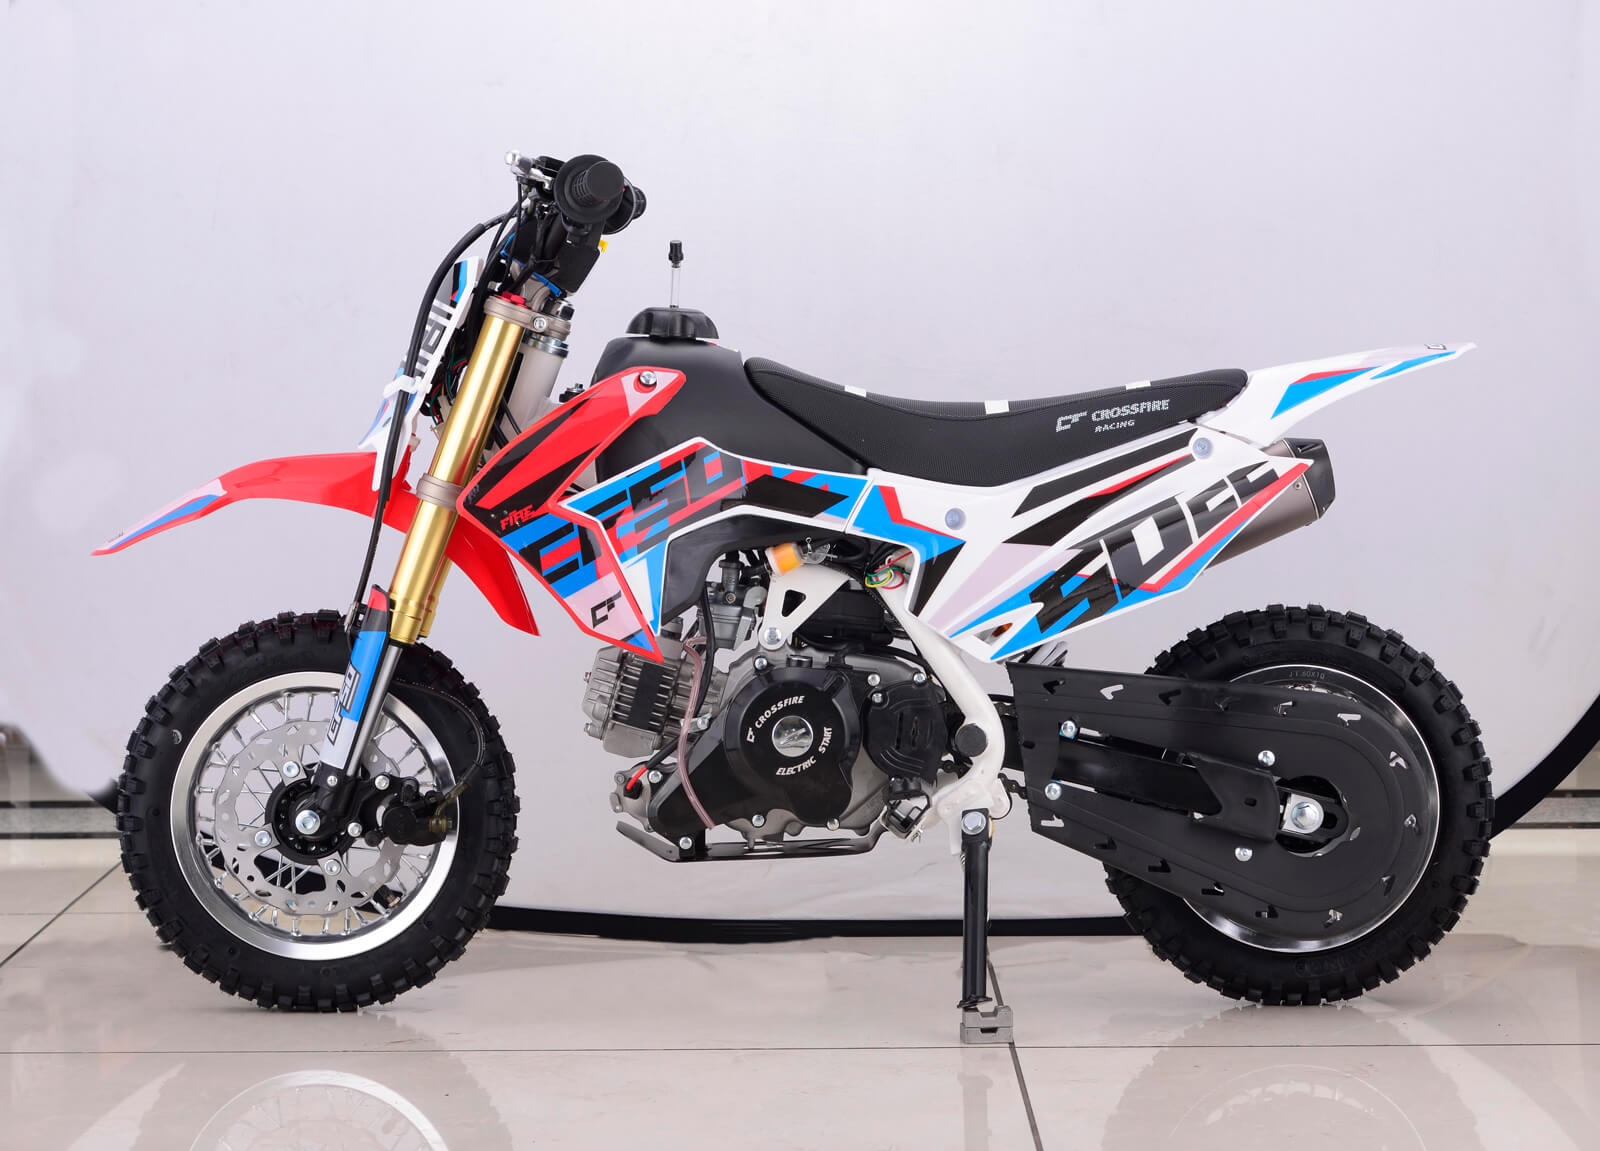 crossfire-cf50-motorbike-dirt-children-kids-red-1